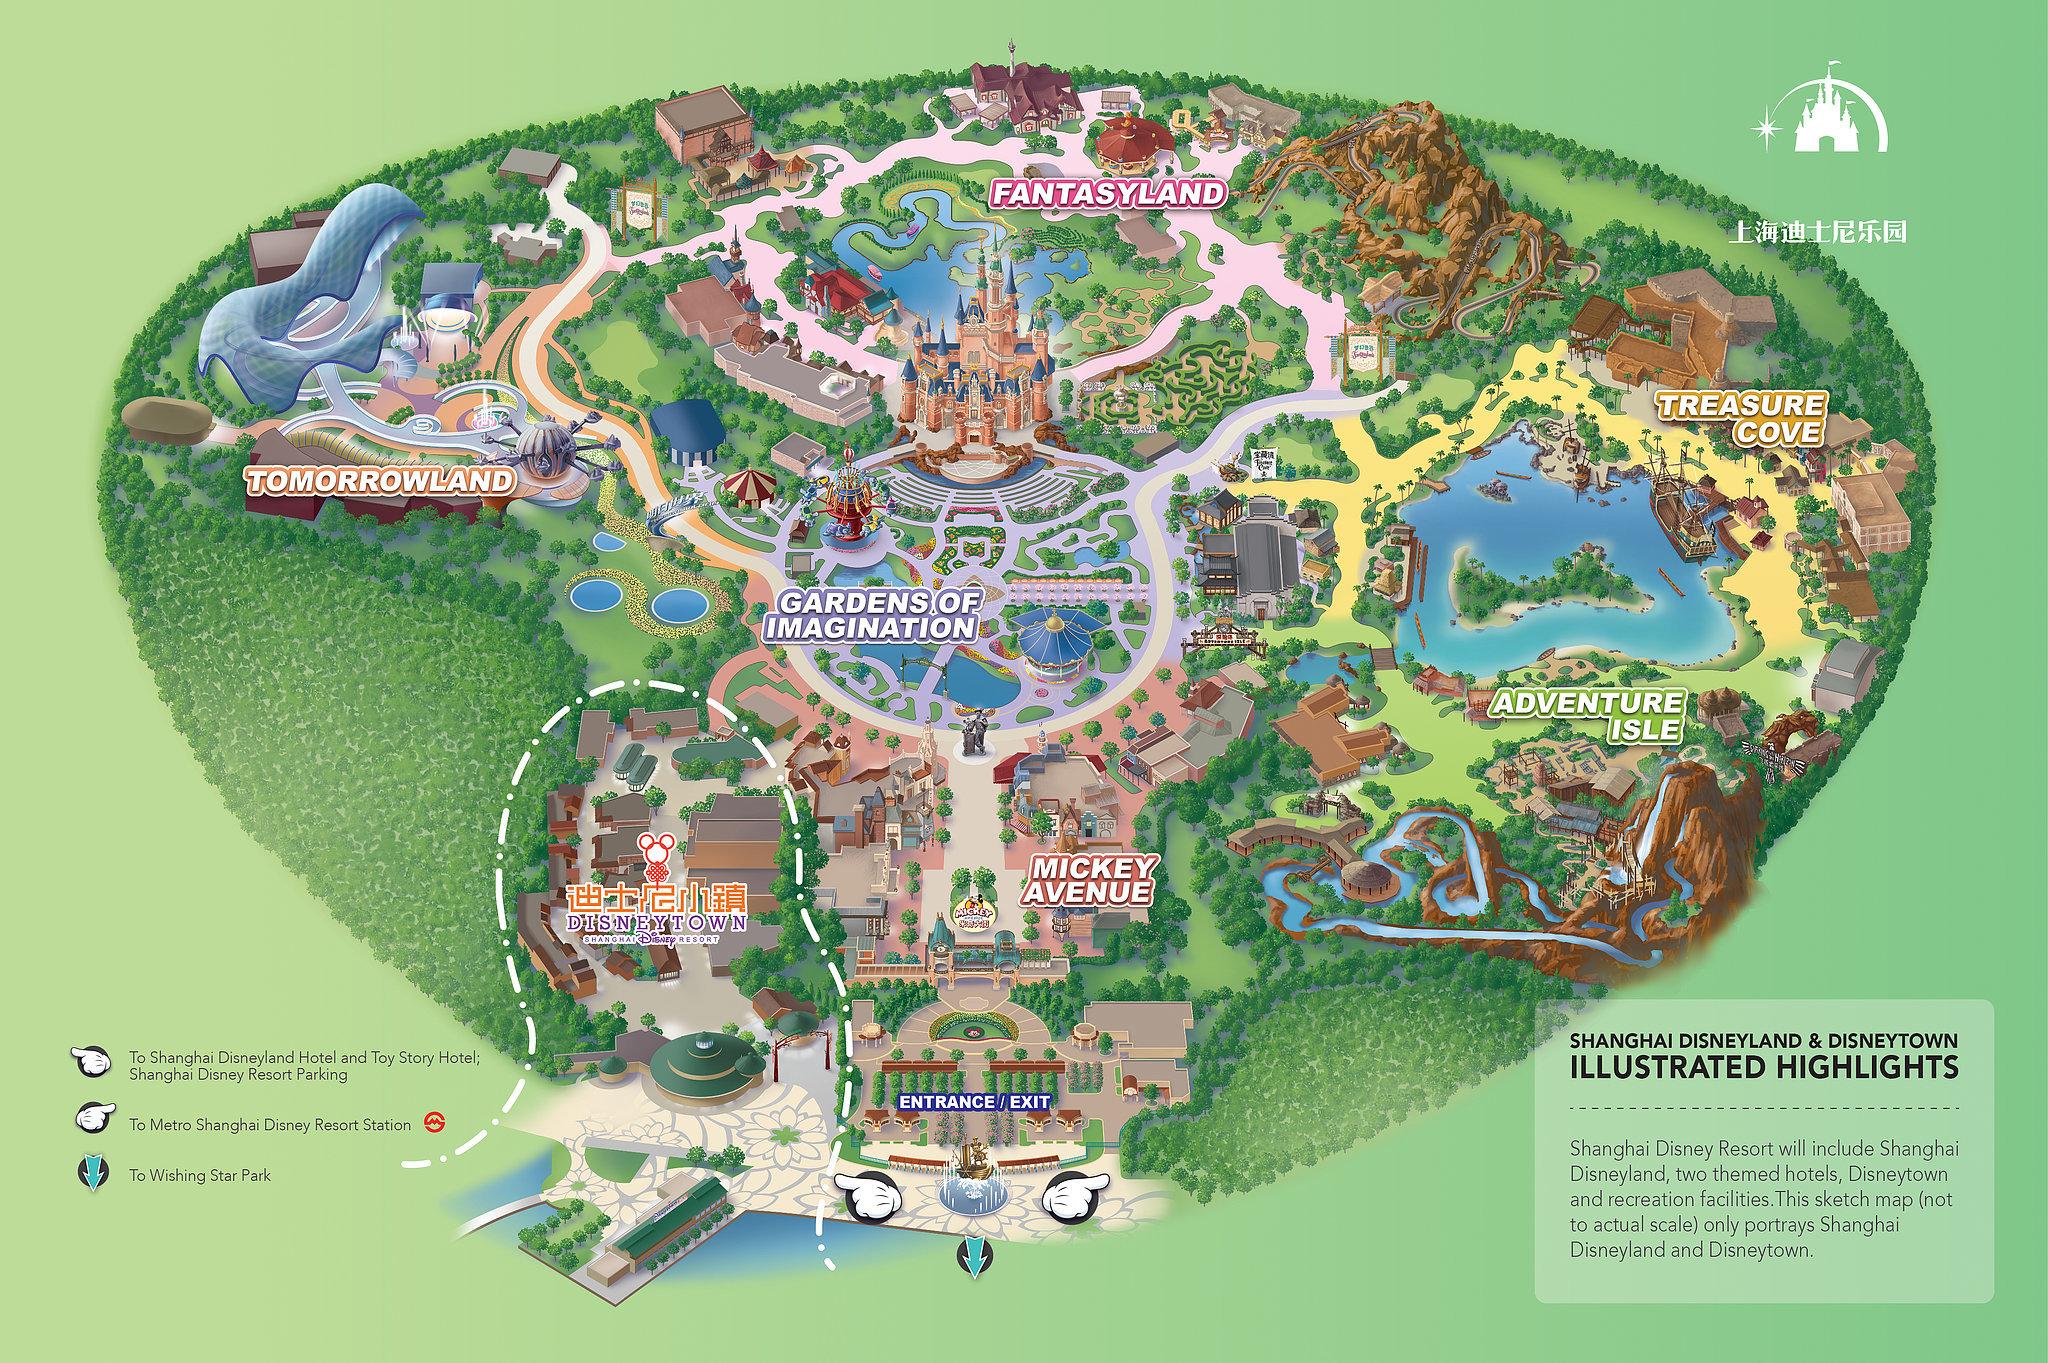 disney park maps pdf with Map Shanghai Disneyland Disneytown on Universal Studios Singapore Map And furthermore Map80 additionally Tour Hongkong Day 4 Have Fun At Disneyland Hongkong moreover Map California Road Trip Planner likewise Map Shanghai Disneyland Disneytown.